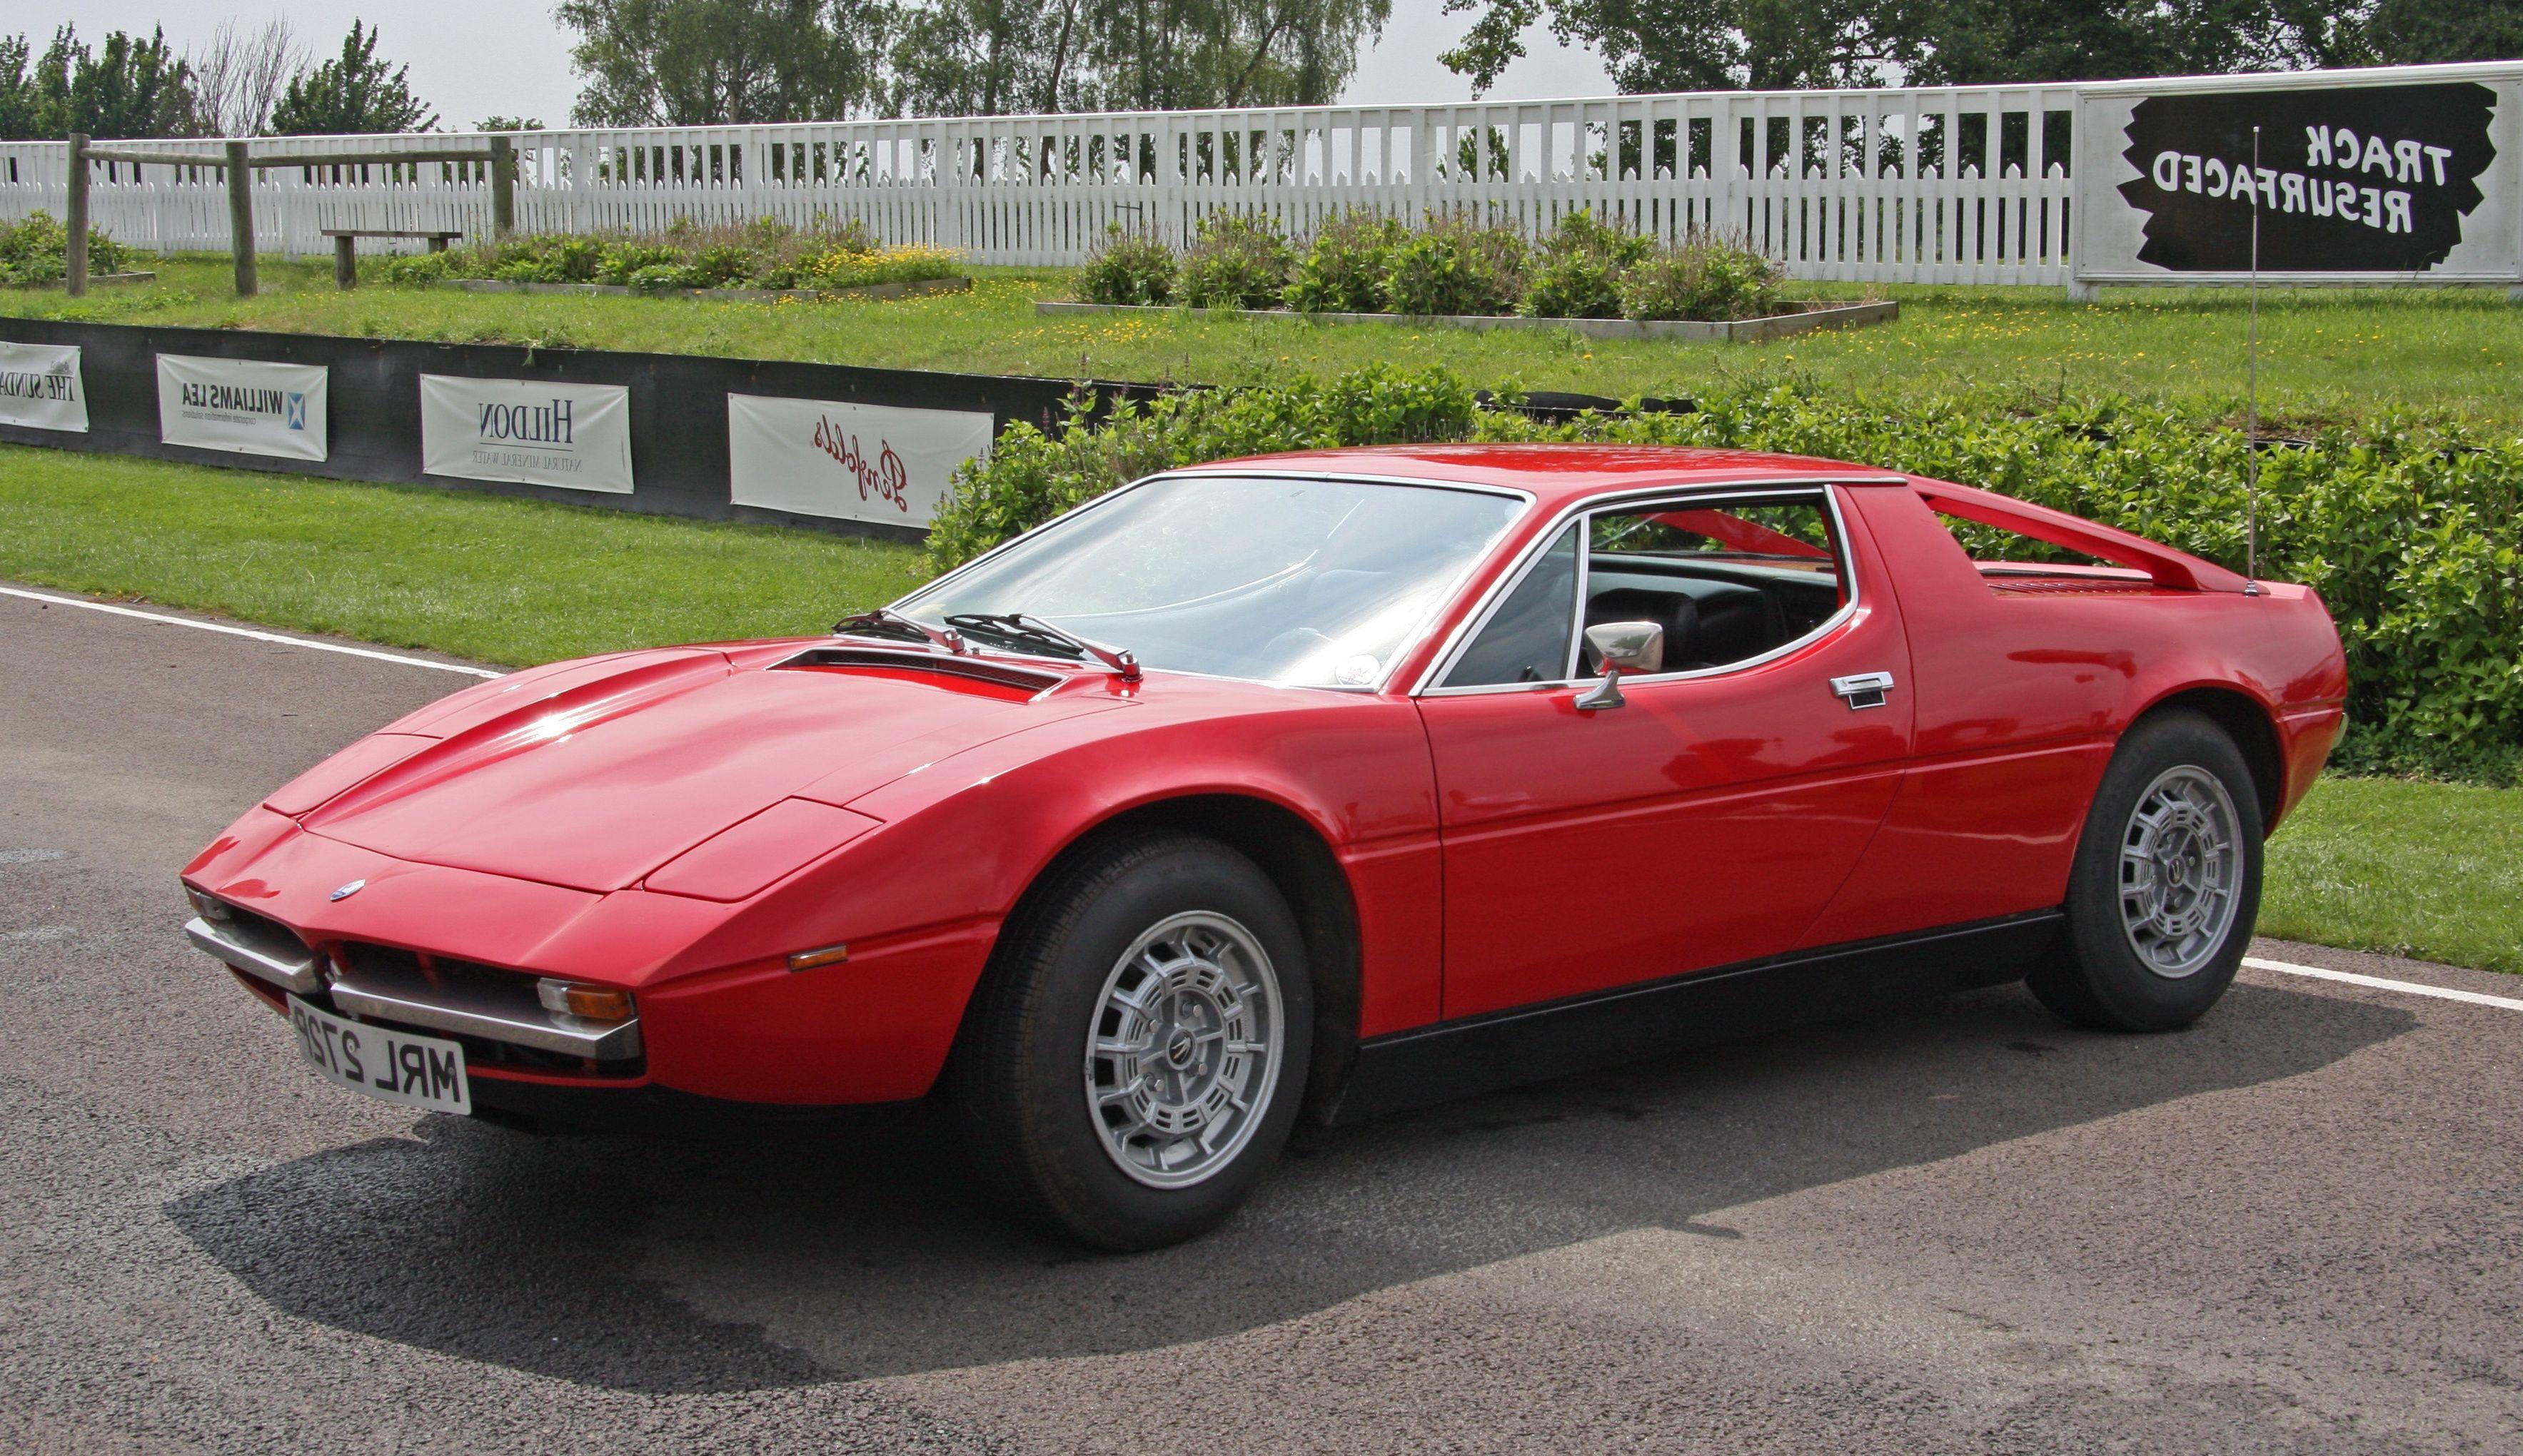 1974 Maserati Bora 4.9 | Maserati bora, Maserati, Classic cars